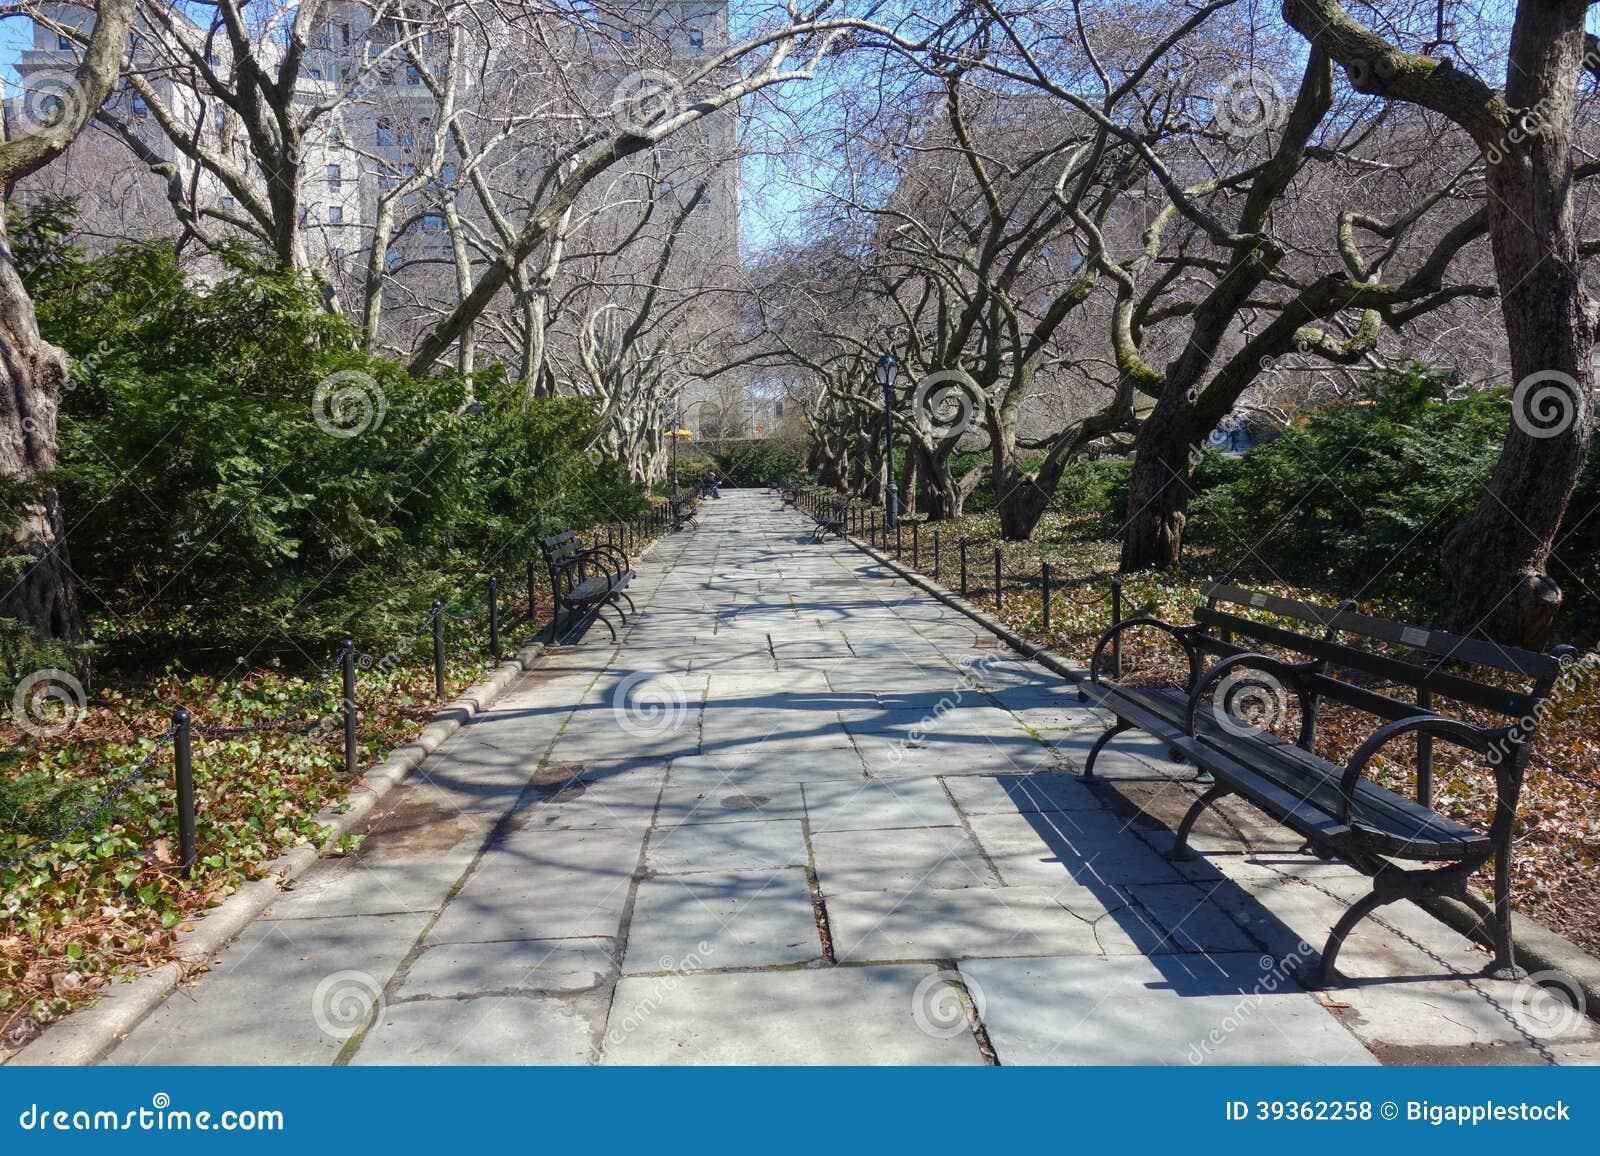 Conservatory Garden in New York City